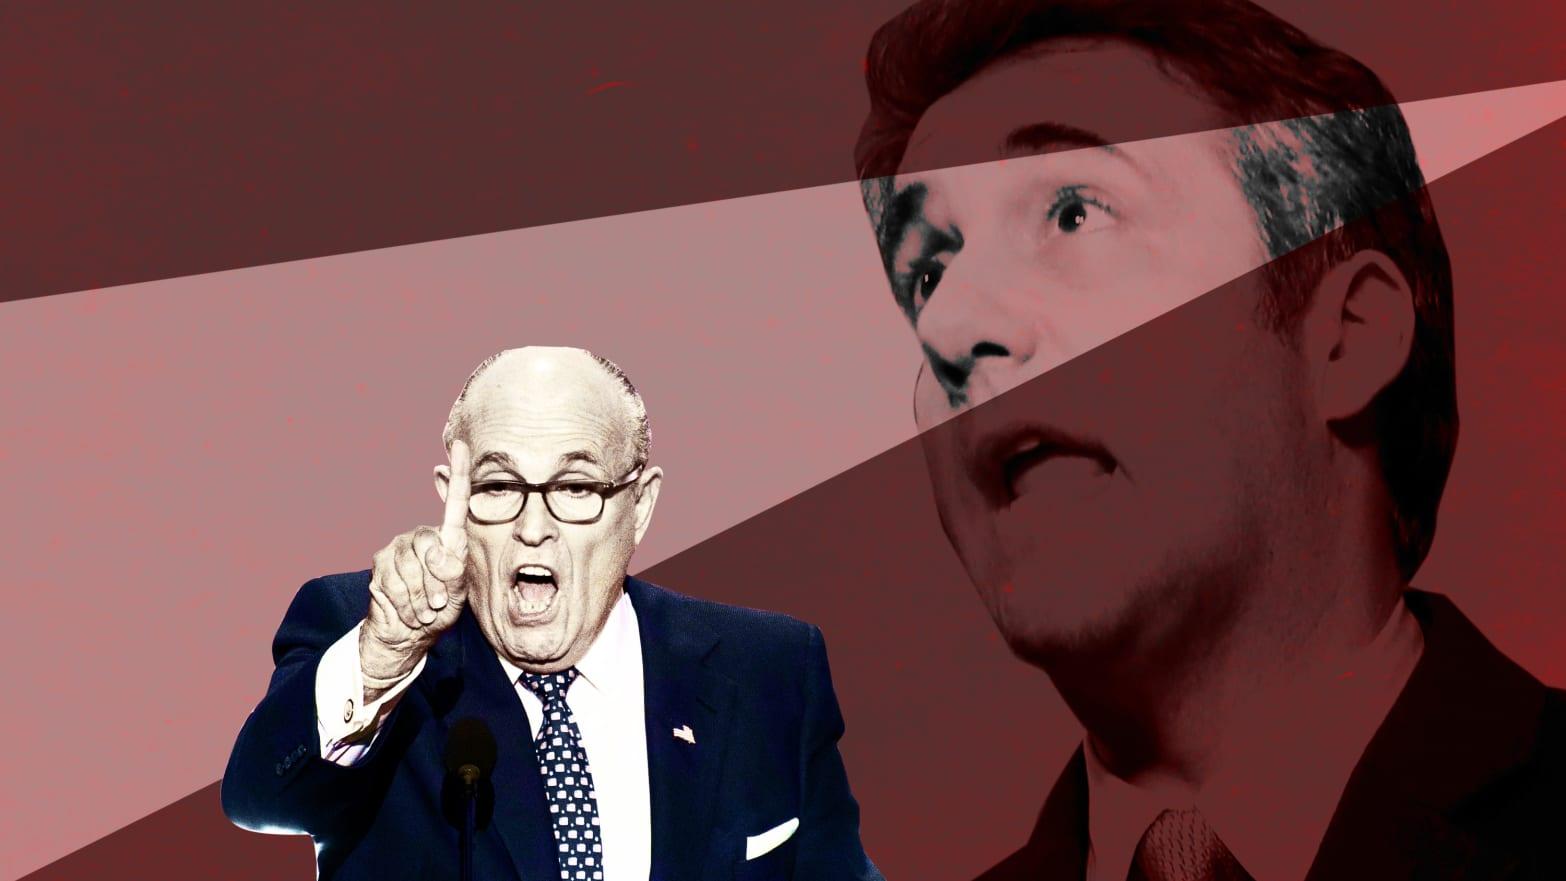 Giuliani Ally: We Weren't Dangling A Pardon to Michael Cohen. We Were Referencing Garth Brooks Lyrics.